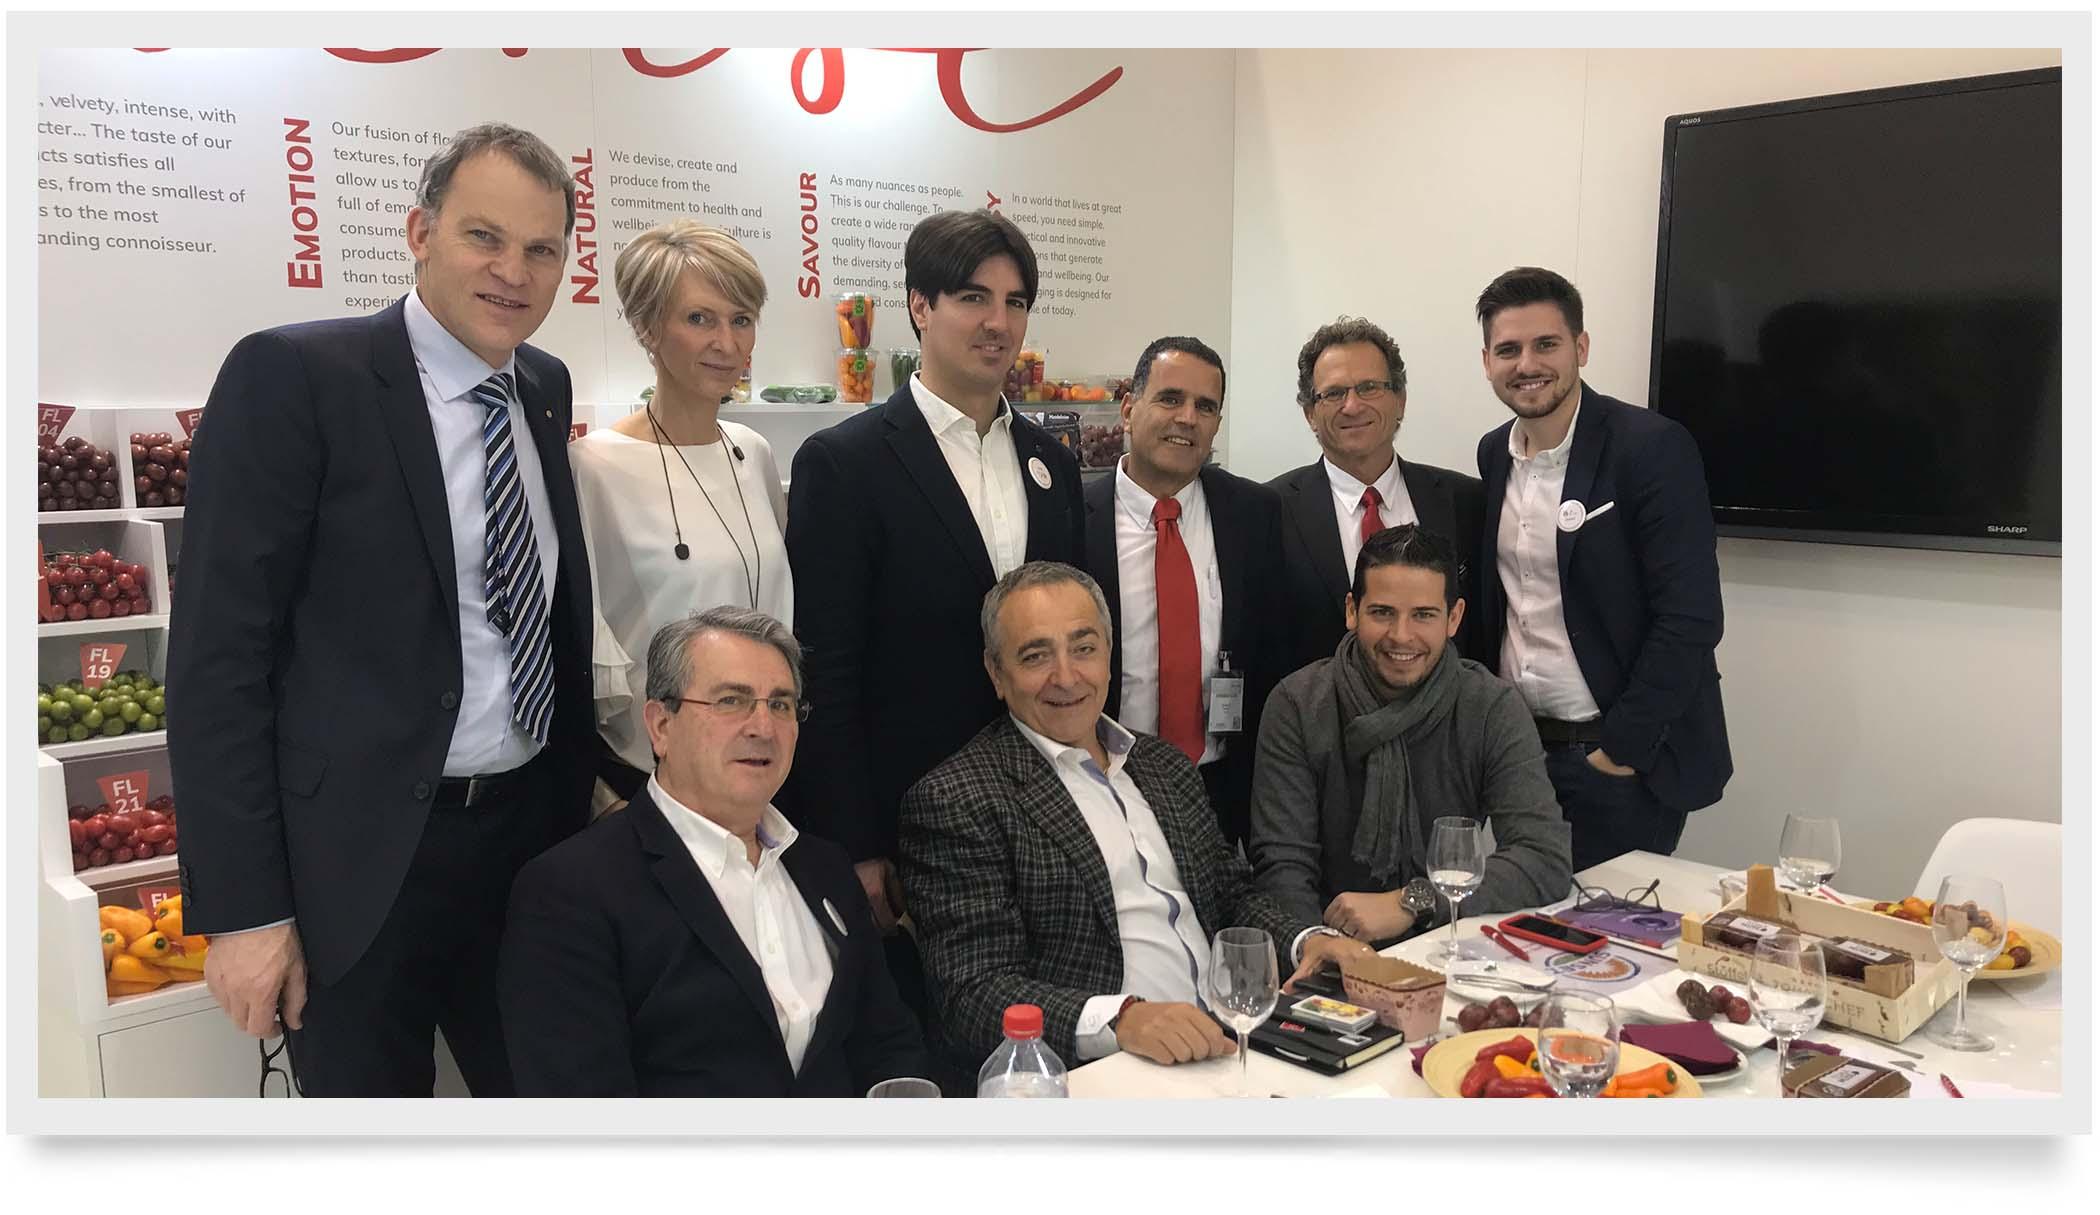 team around the table